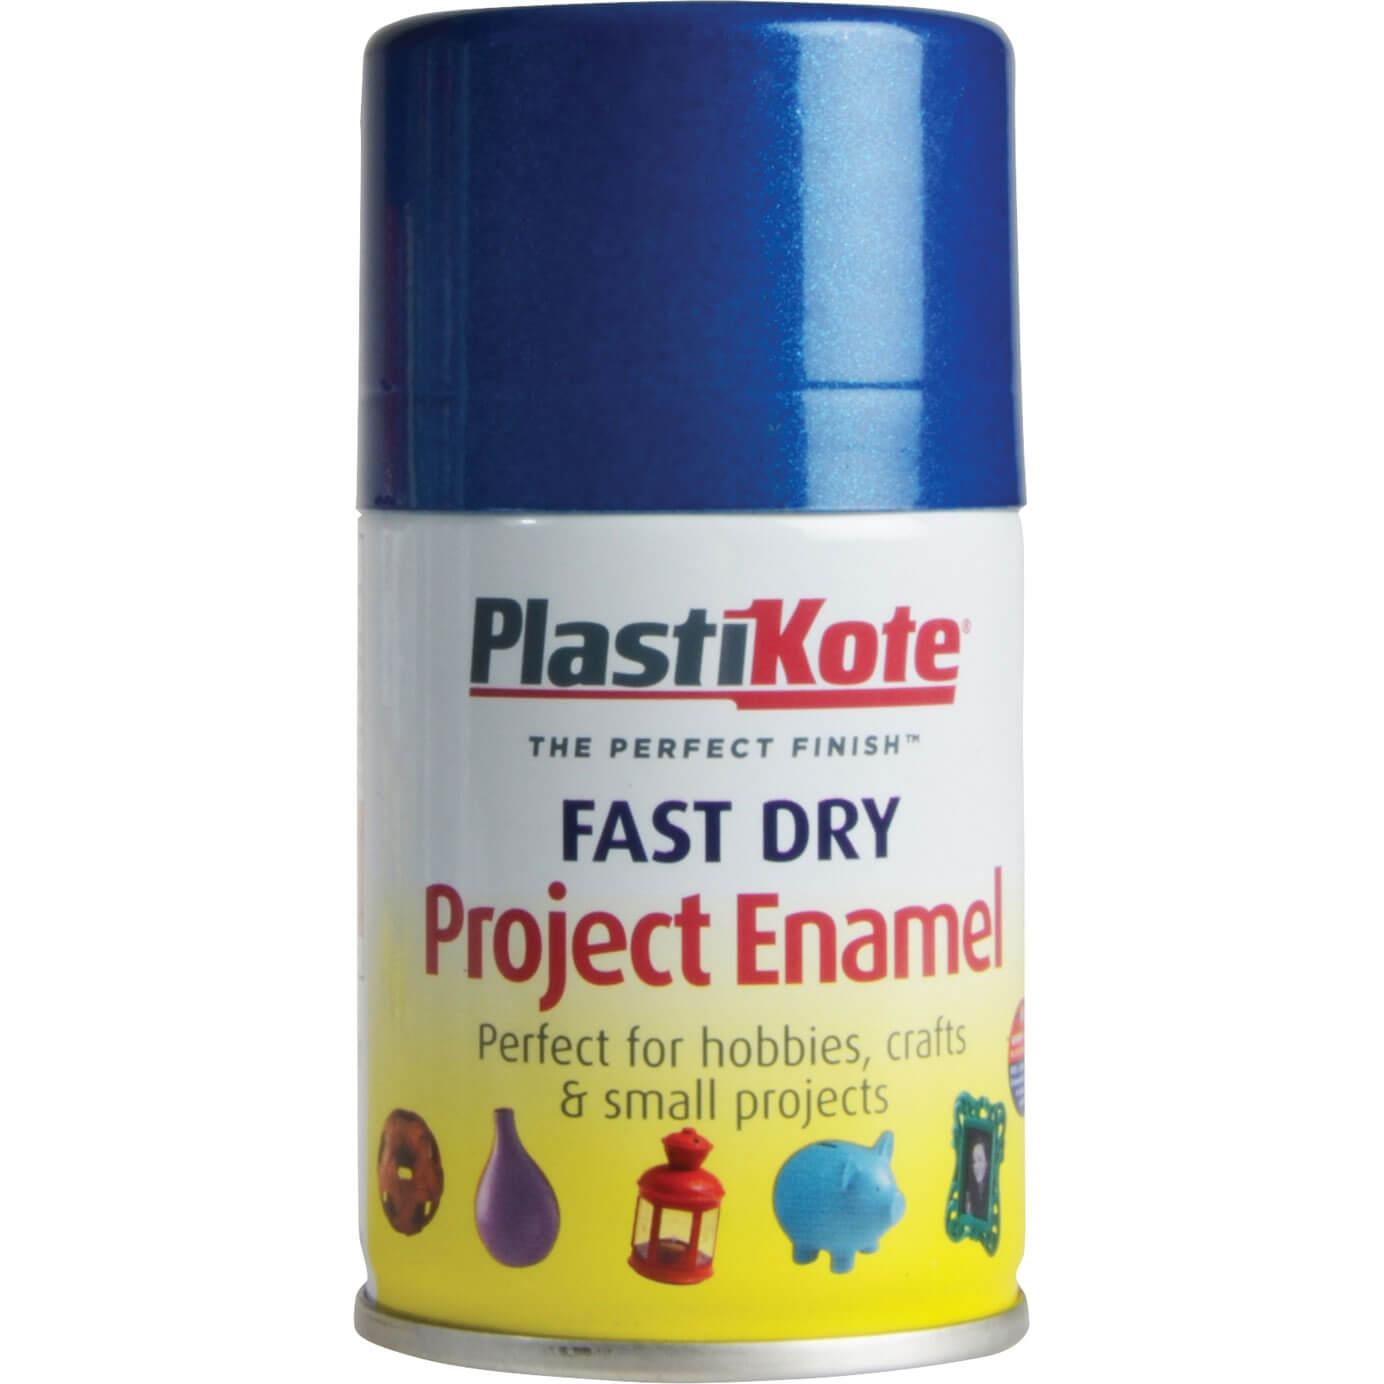 Image of Plastikote Dry Enamel Aerosol Spray Paint Blue 100ml